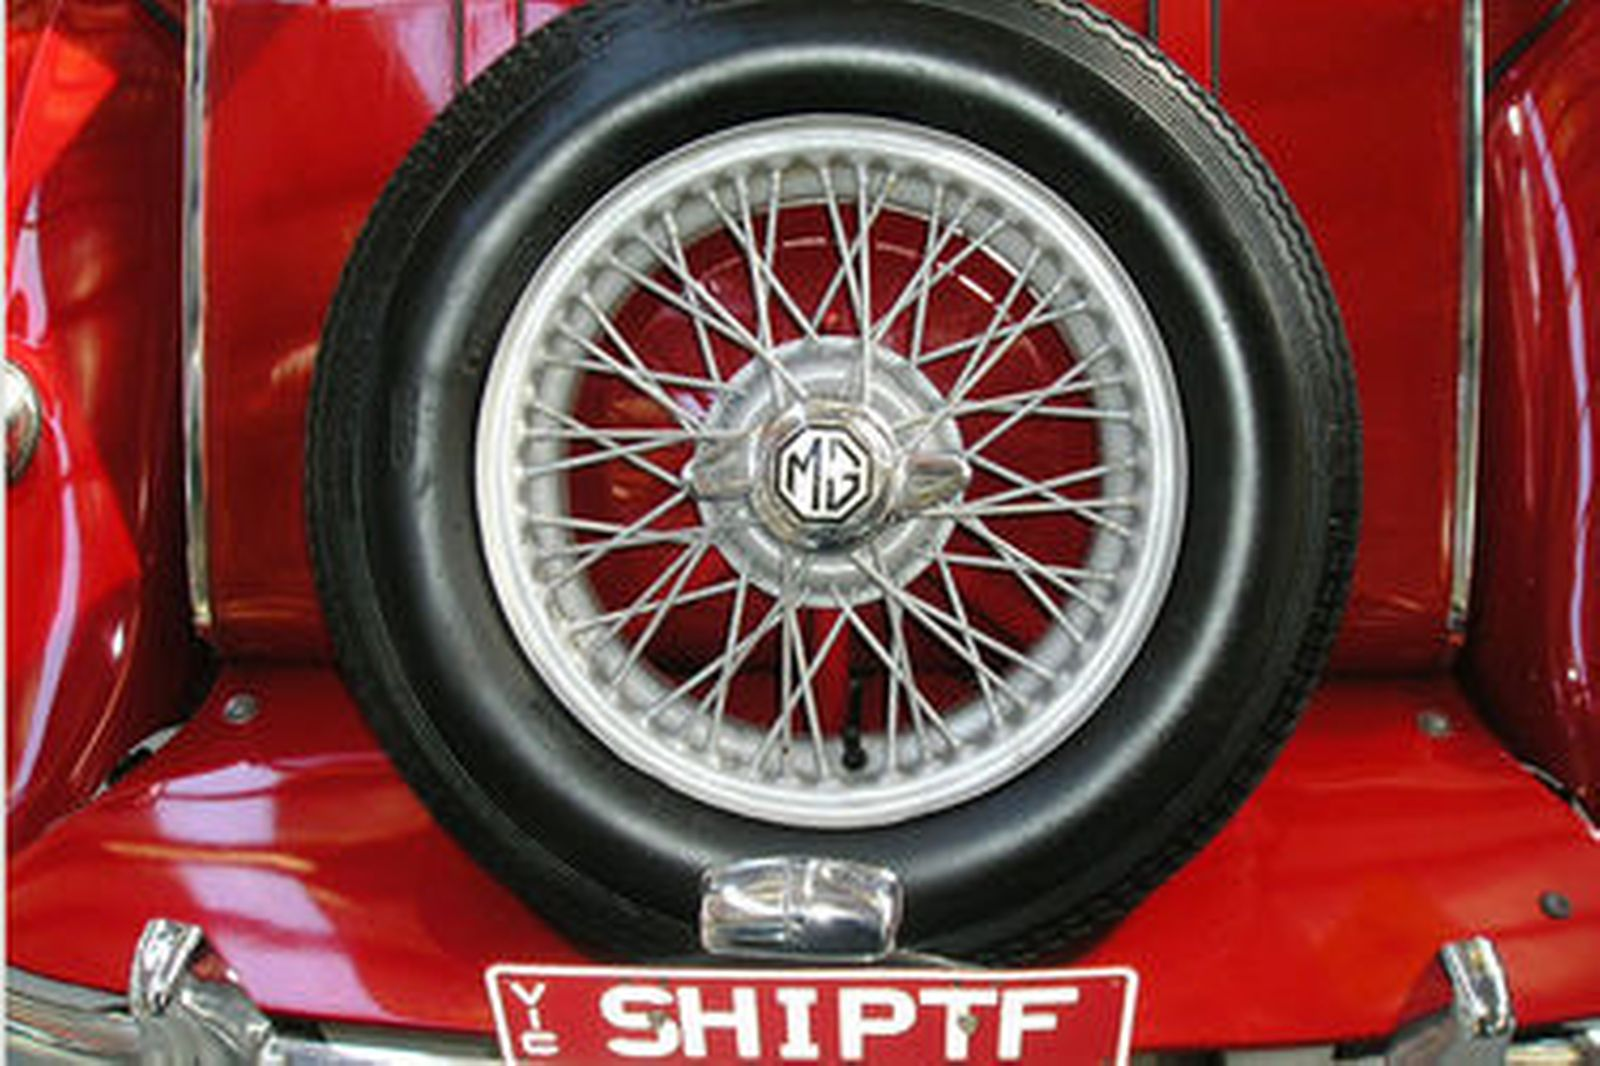 MG TF 1250 Roadster